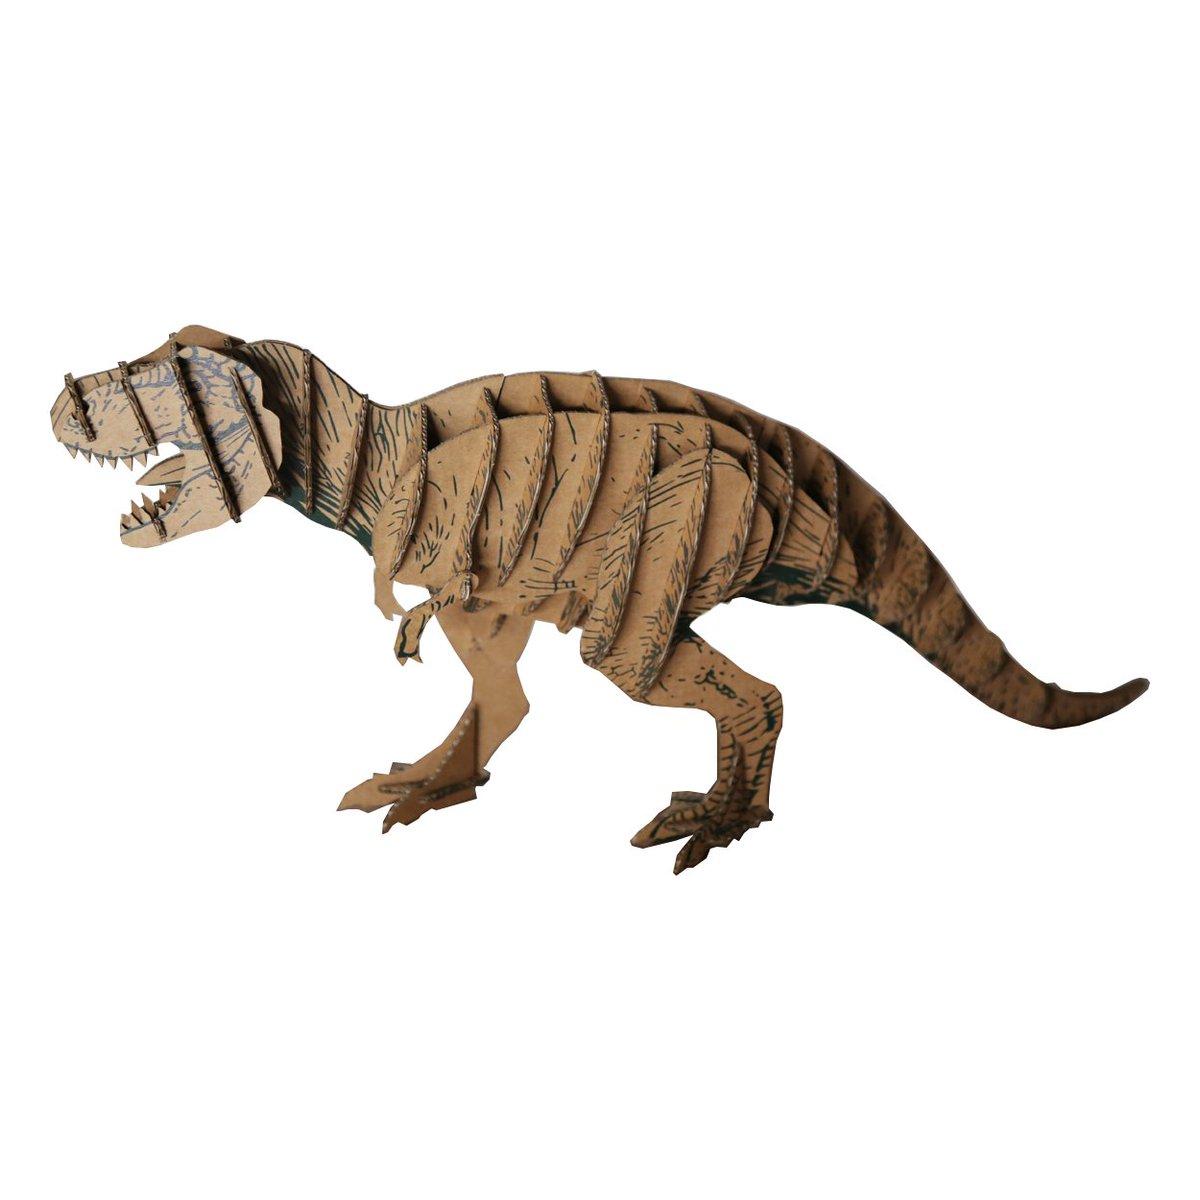 Et Fabriqu En France Atelierchezsoifr Dinosaure Tyrannosaurus Rex Carton Brun A Construire M 48x22x12 Animatomy C2x27658775